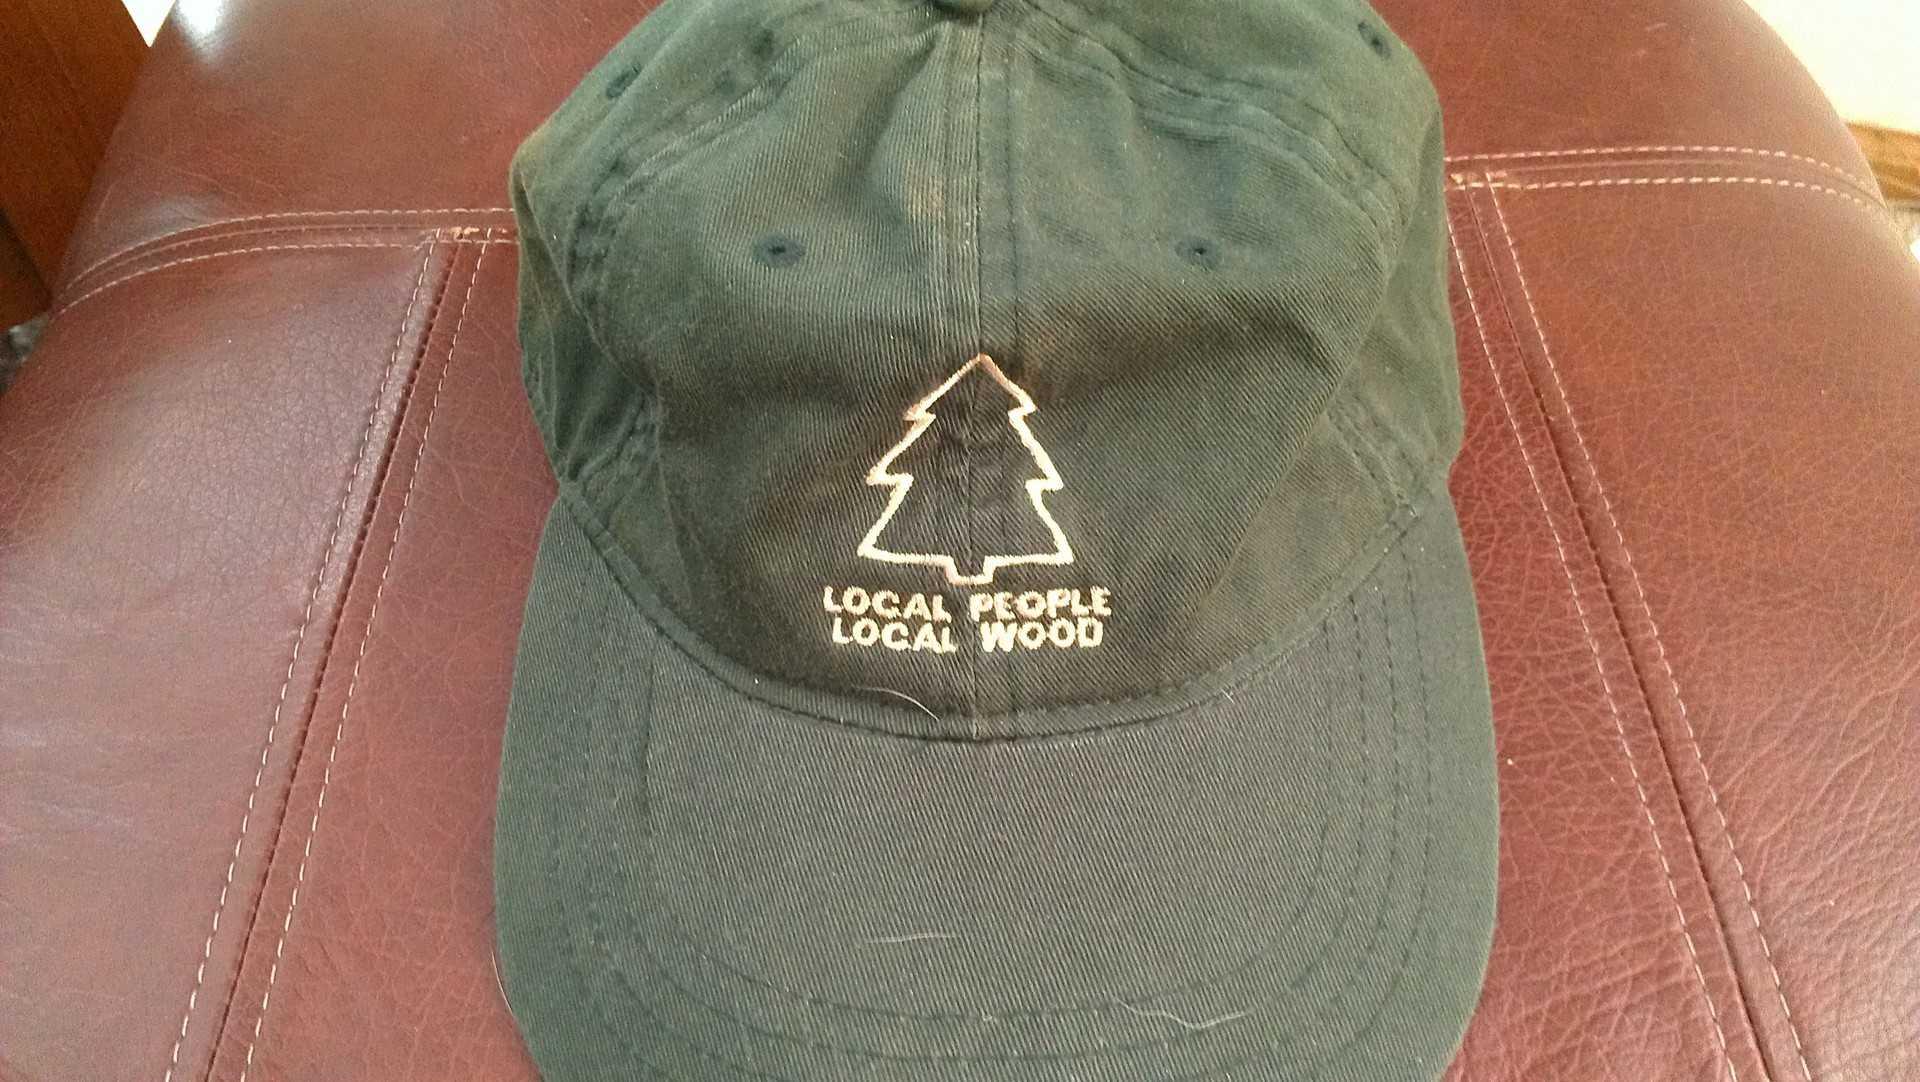 local wood 2